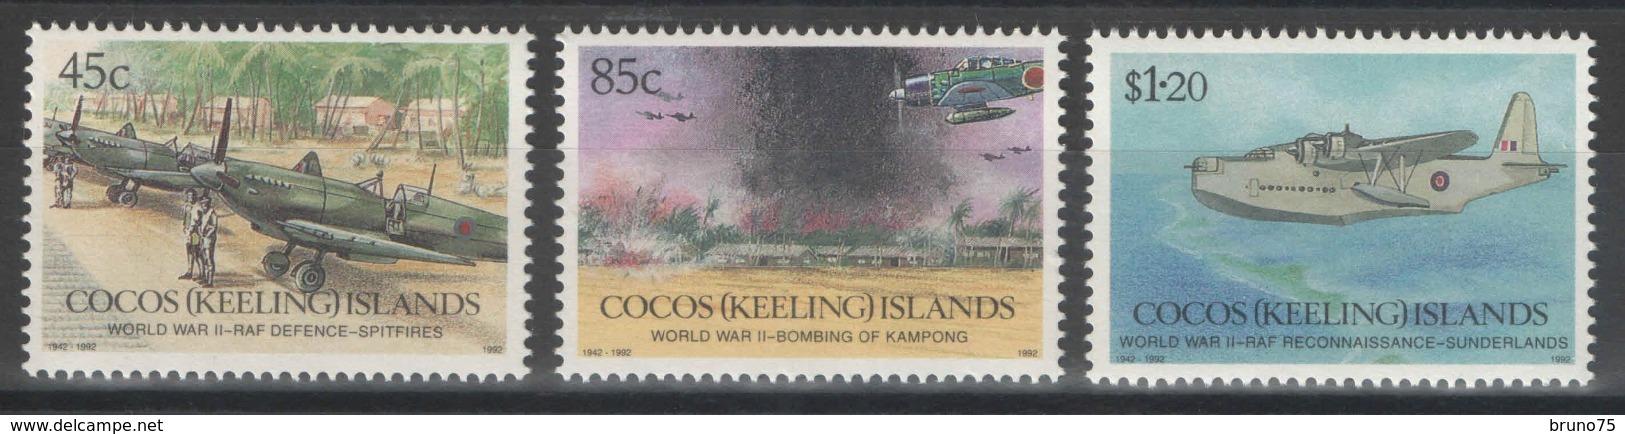 Cocos (Keeling) Islands - YT 261-263 ** MNH - 1992 - WW2 - Cocos (Keeling) Islands